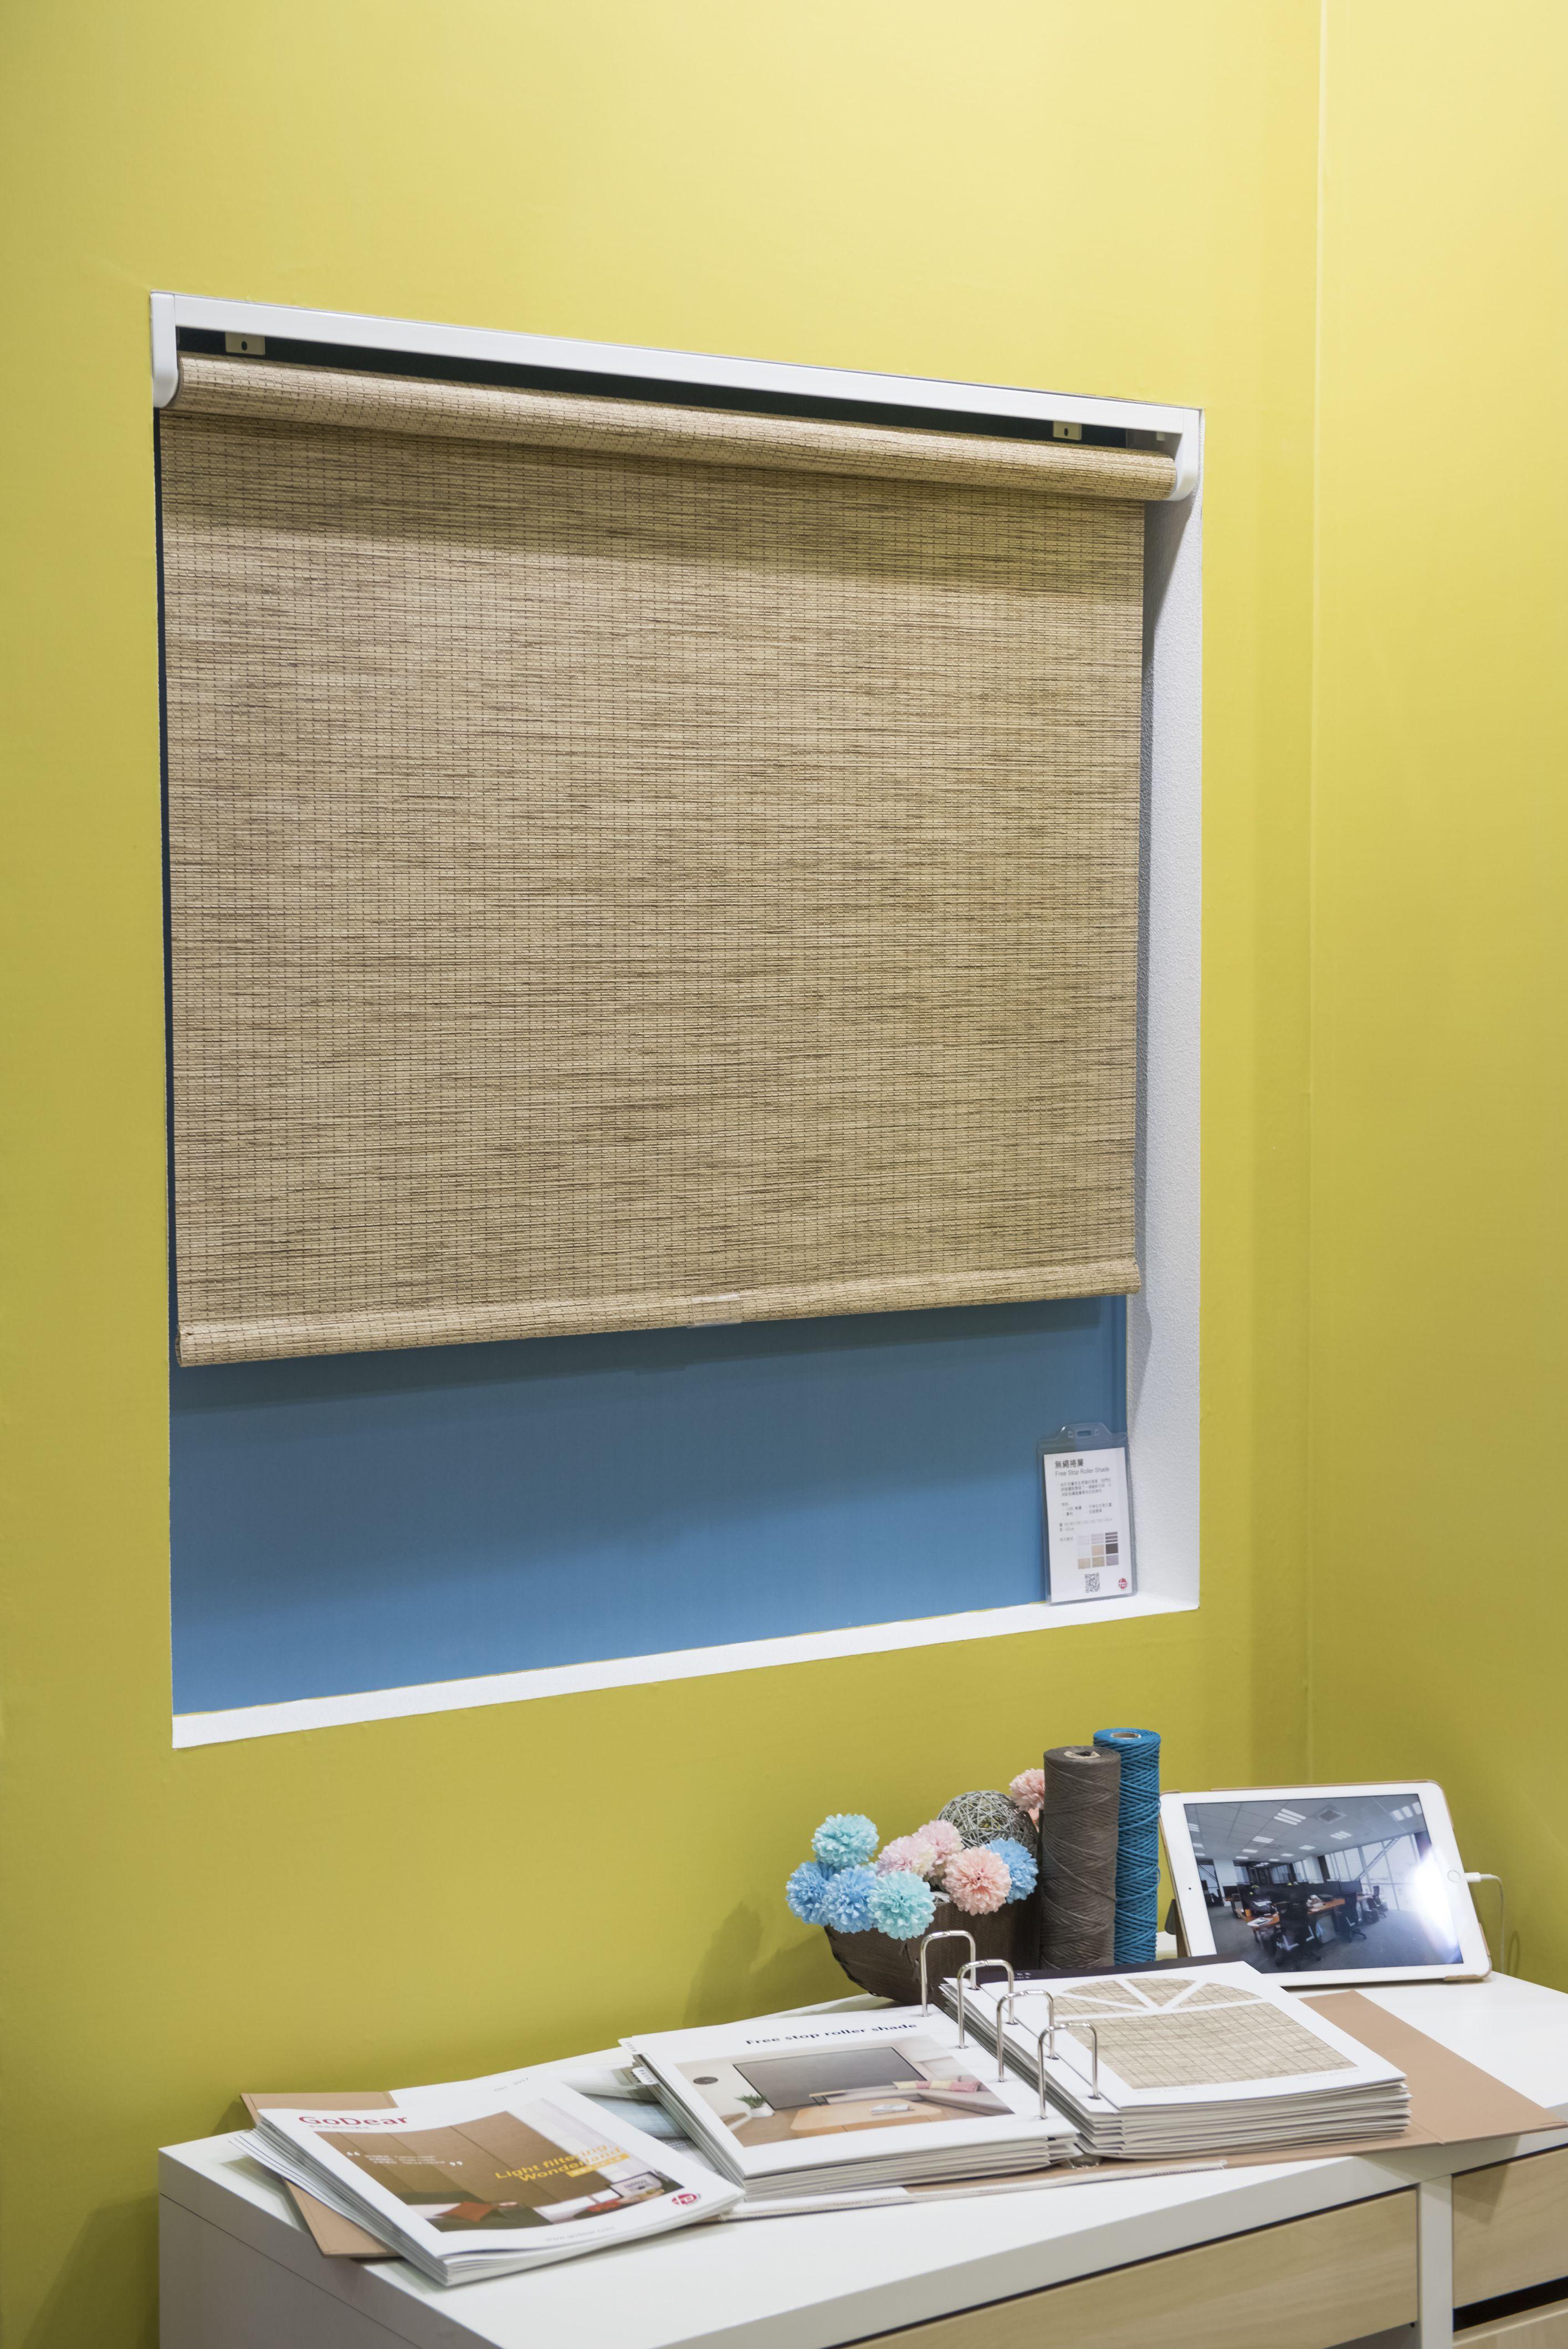 roman shades mainstays canada tips home cheap fabric depot burlap blinds treatments window uk ideas reviews cordless wood